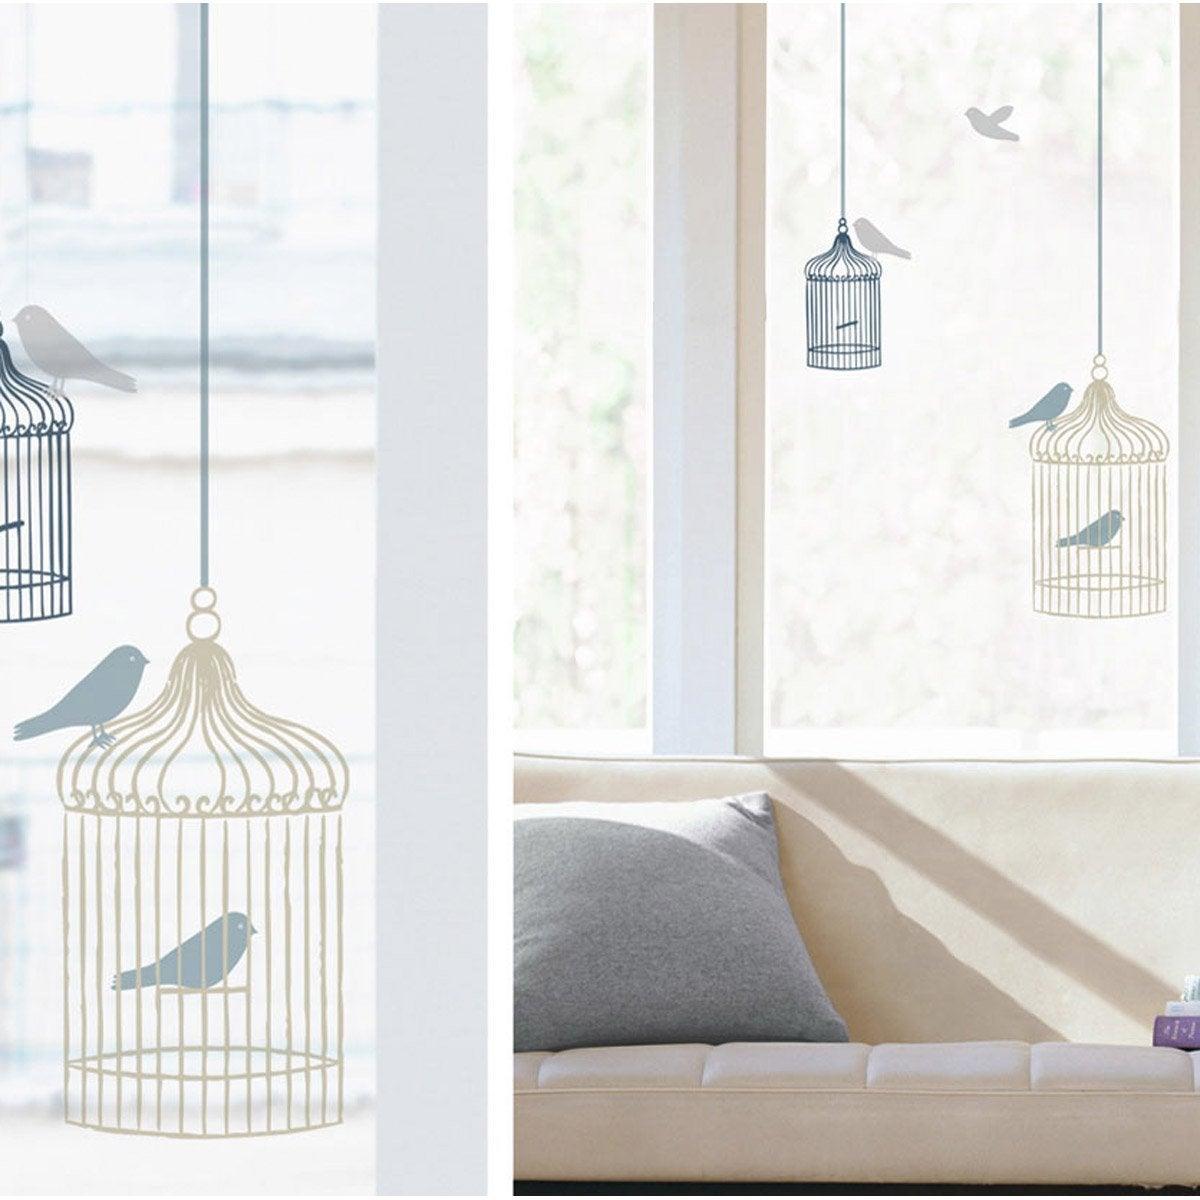 sticker cages oiseaux 24 cm x 69 cm leroy merlin. Black Bedroom Furniture Sets. Home Design Ideas